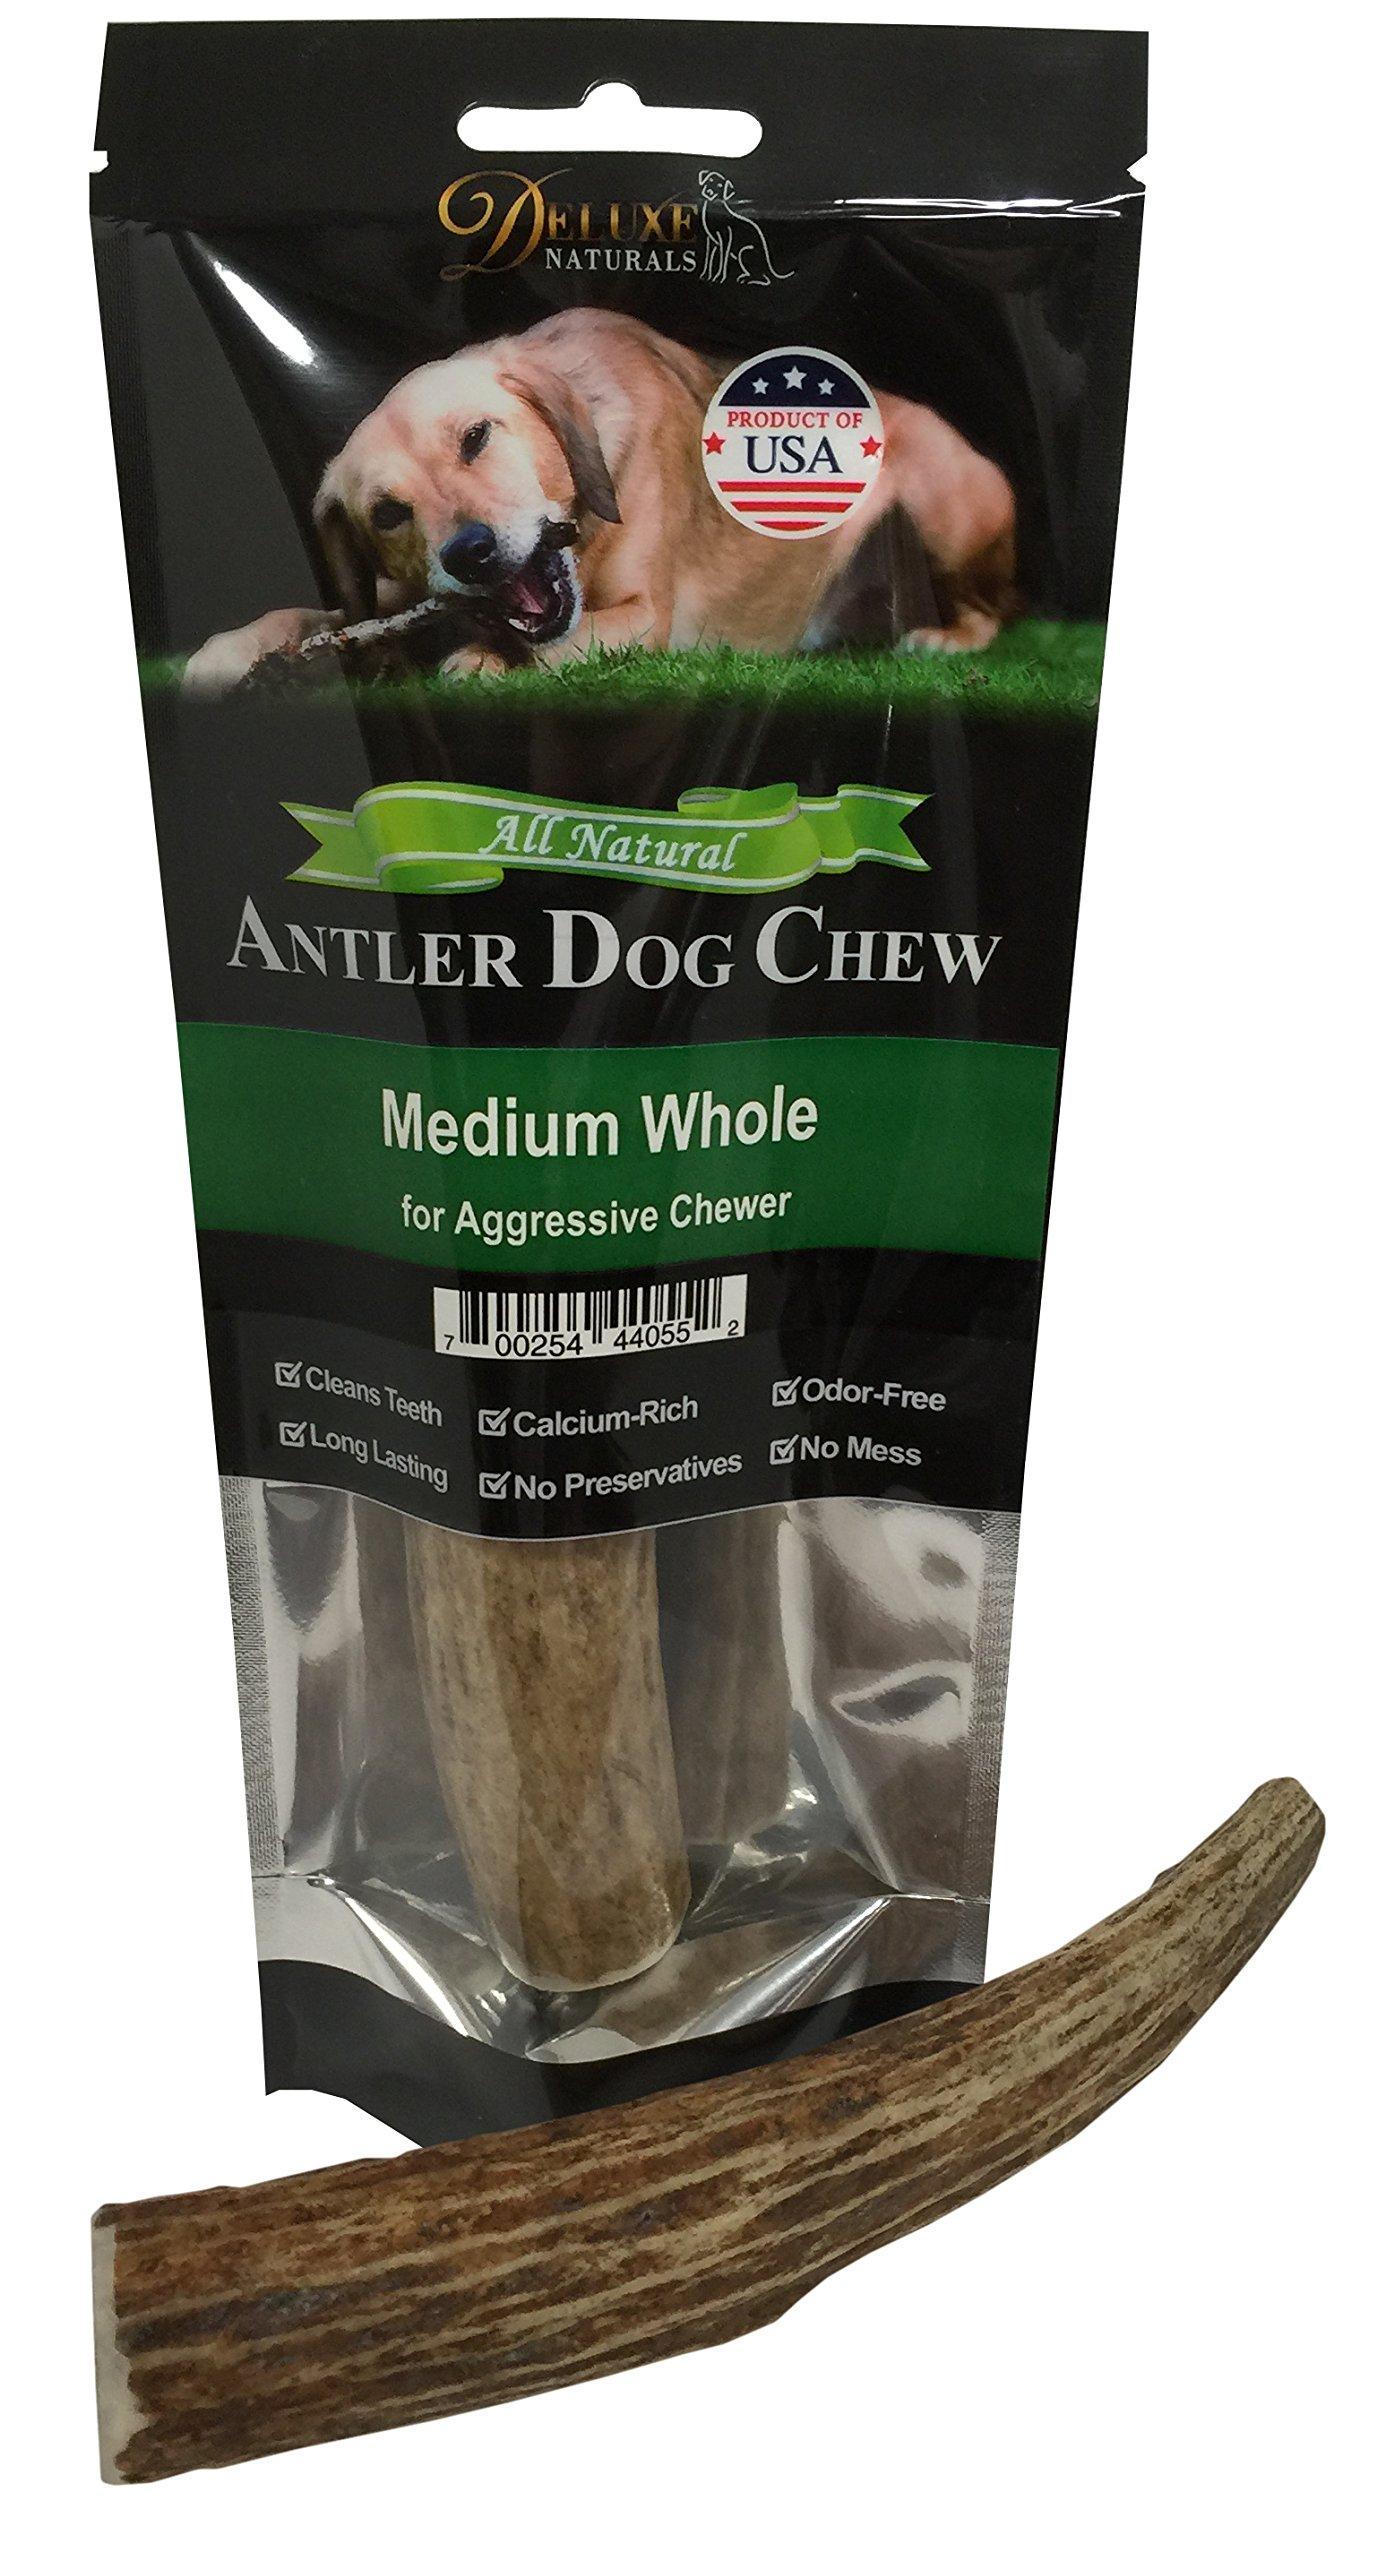 Deluxe Naturals Whole Antler Medium